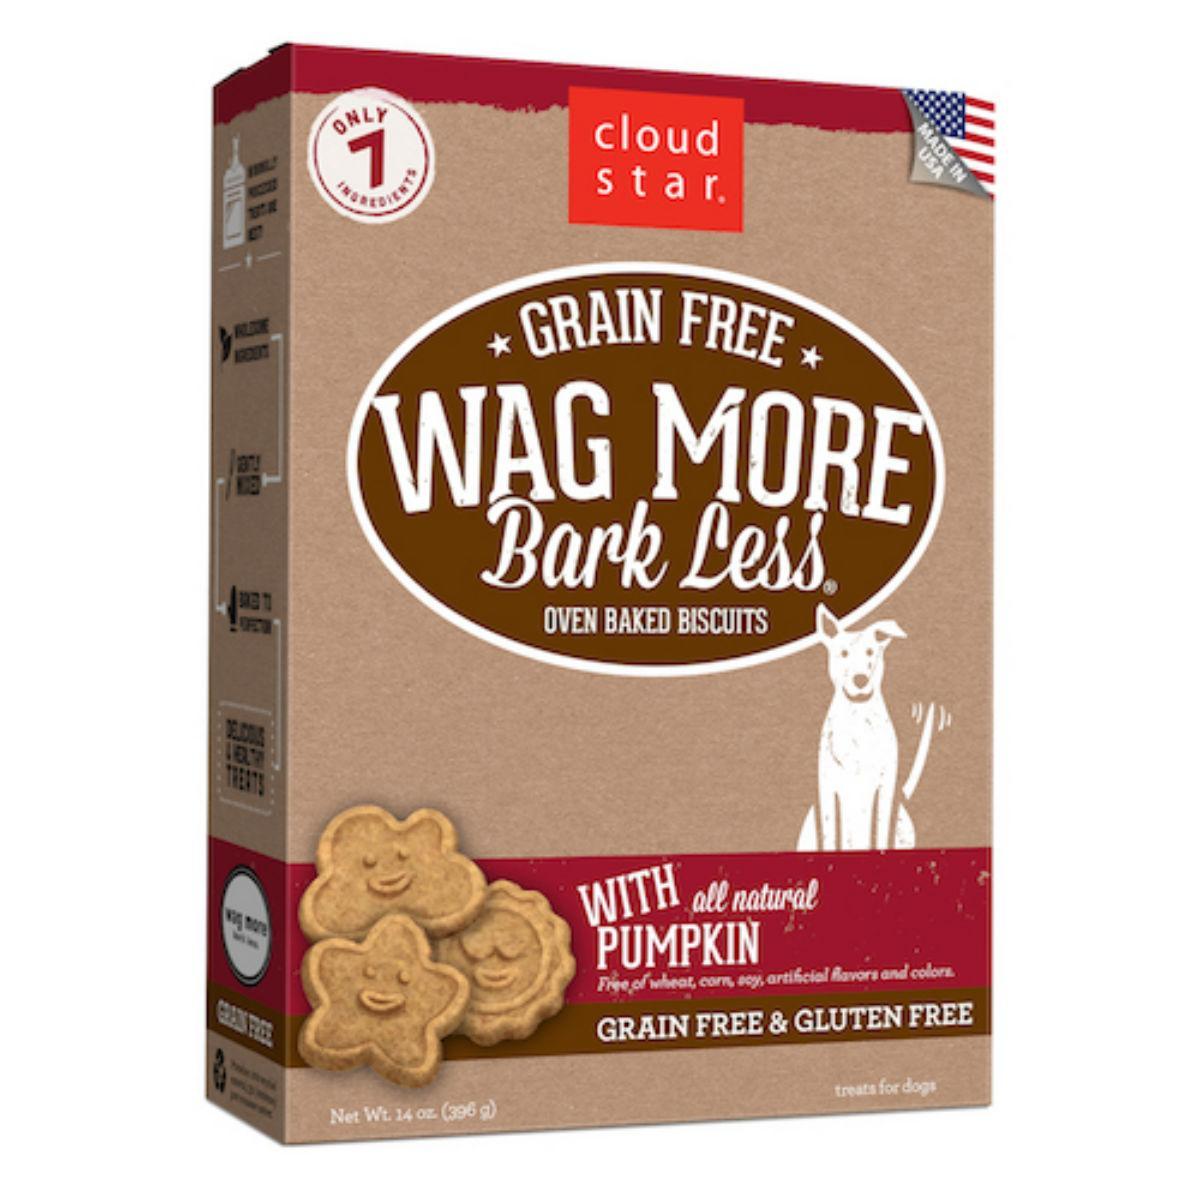 Cloud Star Wag More Bark Less Grain Free Baked Dog Treat - Pumpkin